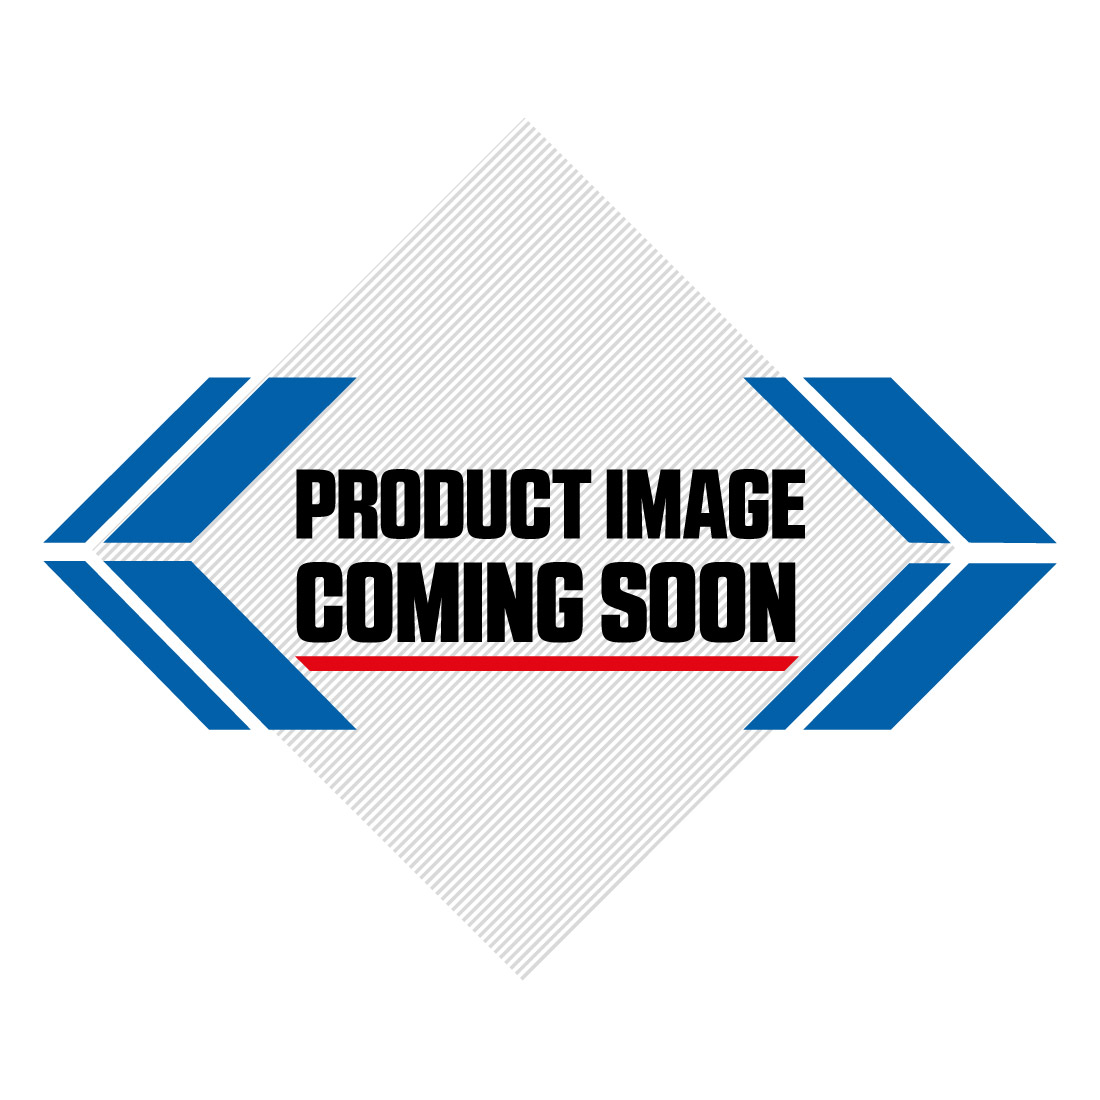 2019 UFO Interceptor 2 Helmet - Galaxy Limited Edition Image-2>